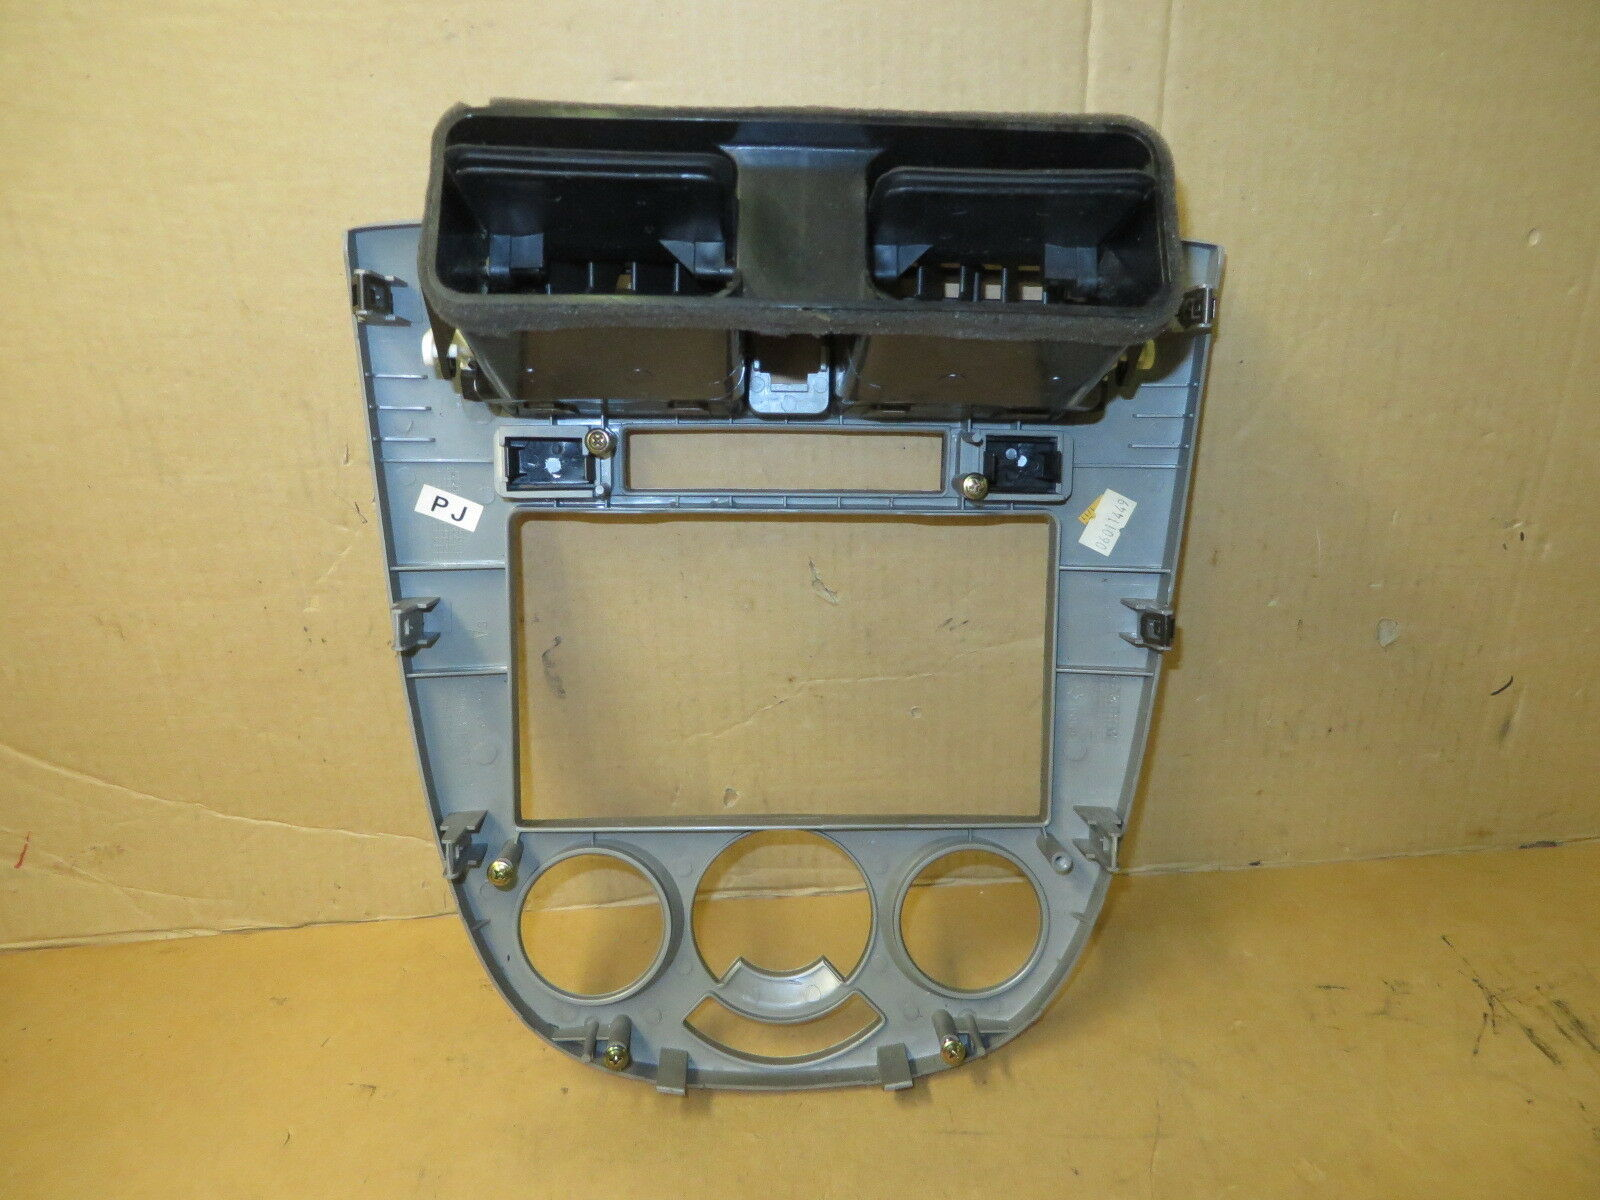 "Chevy Chevelle 68-73//GMC Caballero 78-87 3 ROW Aluminum Radiator 17/"" x 21/"" Core"